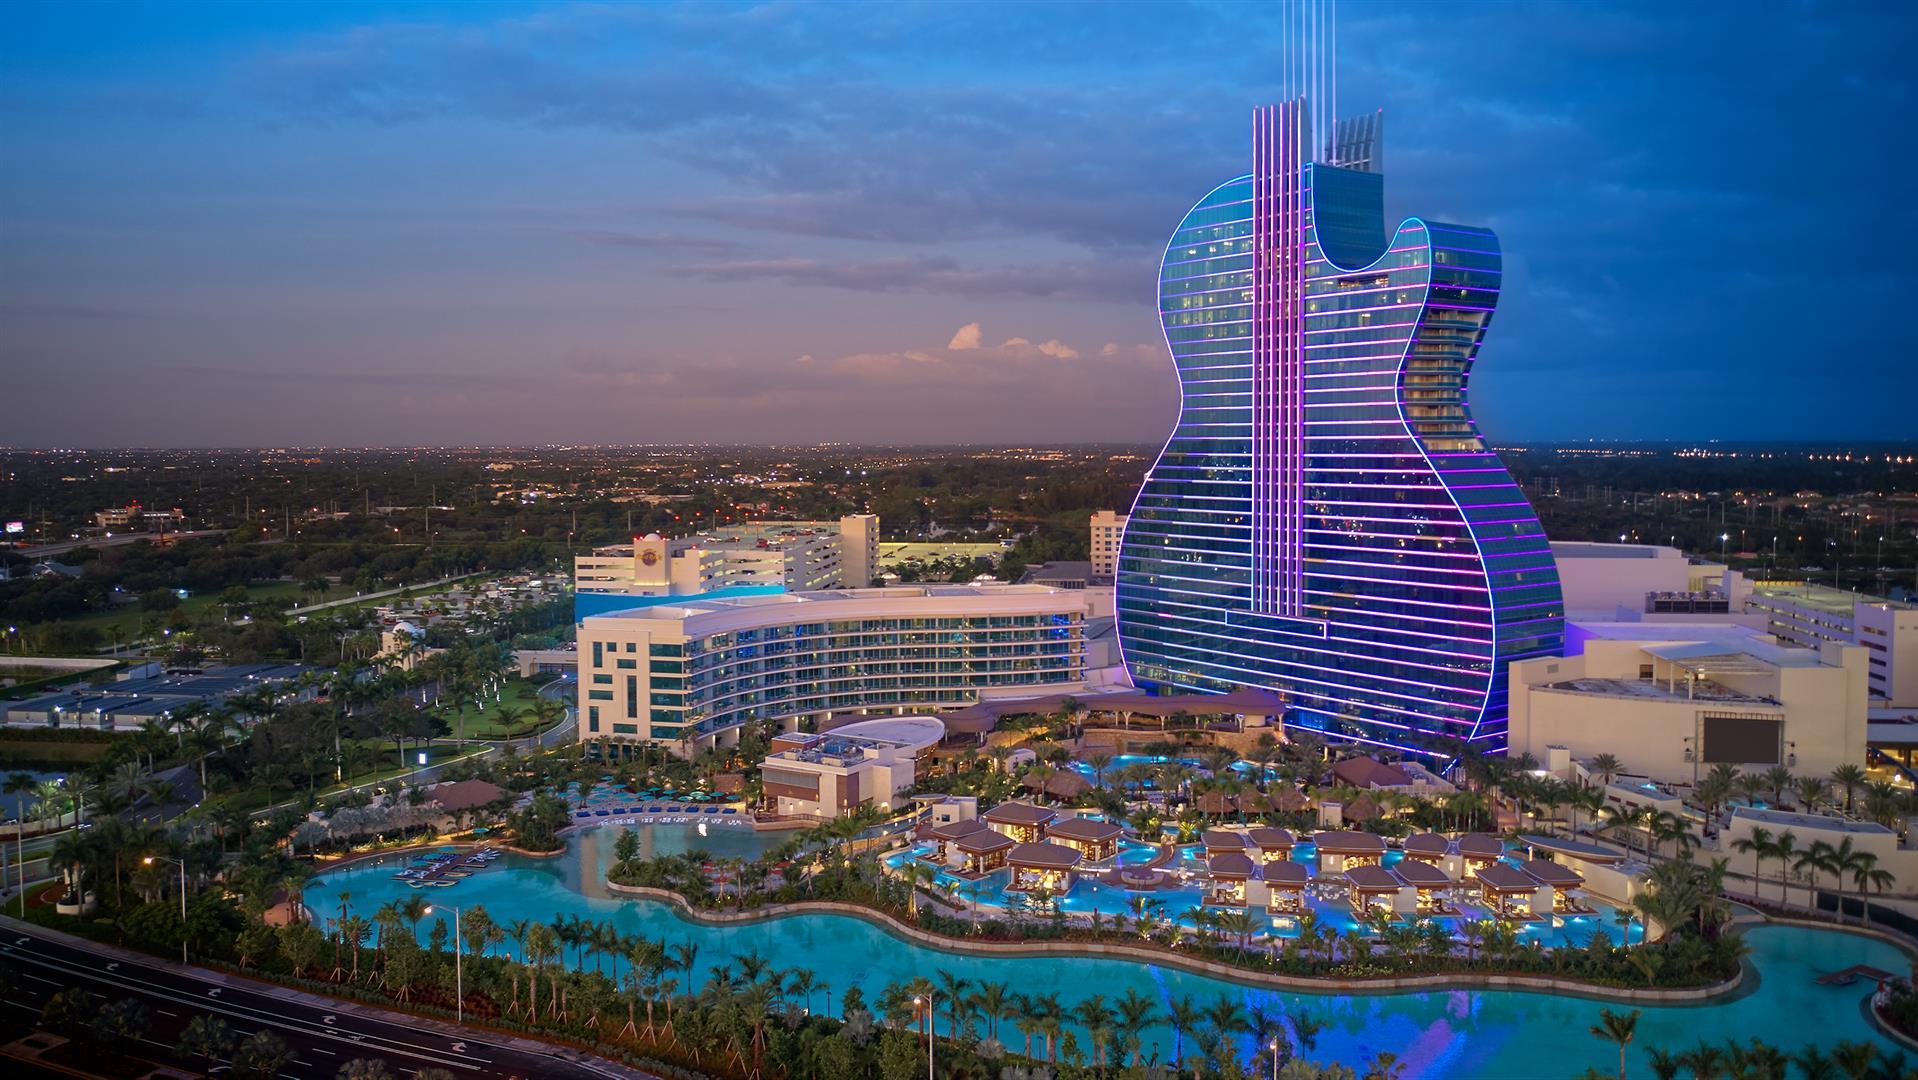 Seminole Hard Rock Hotel & Casino Hollywood คาสิโนเจ้าภาพนางงามจักรวาลปี 2020